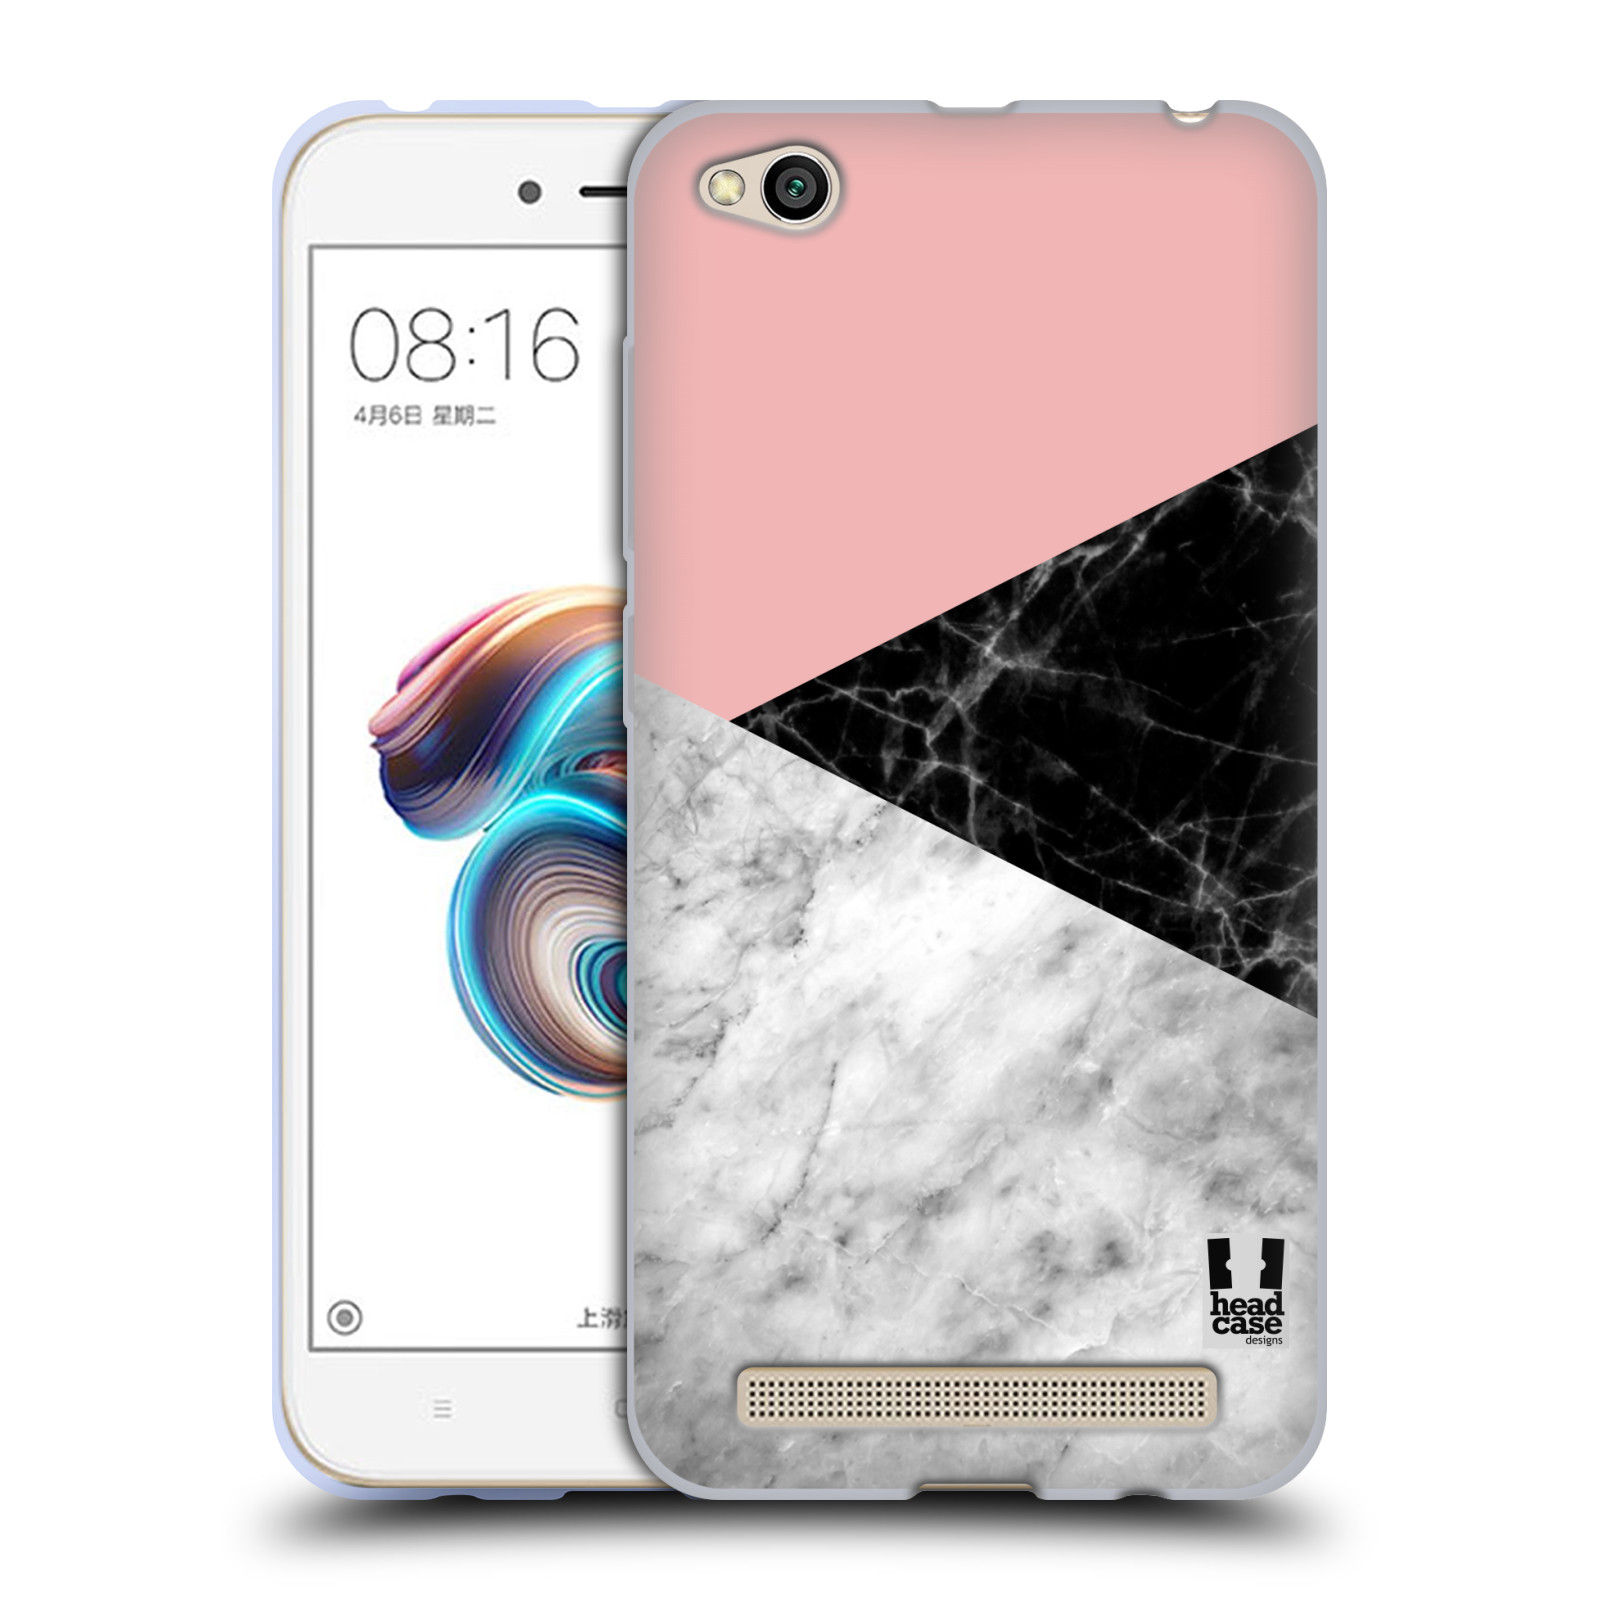 Silikonové pouzdro na mobil Xiaomi Redmi 5A - Head Case - Mramor mix